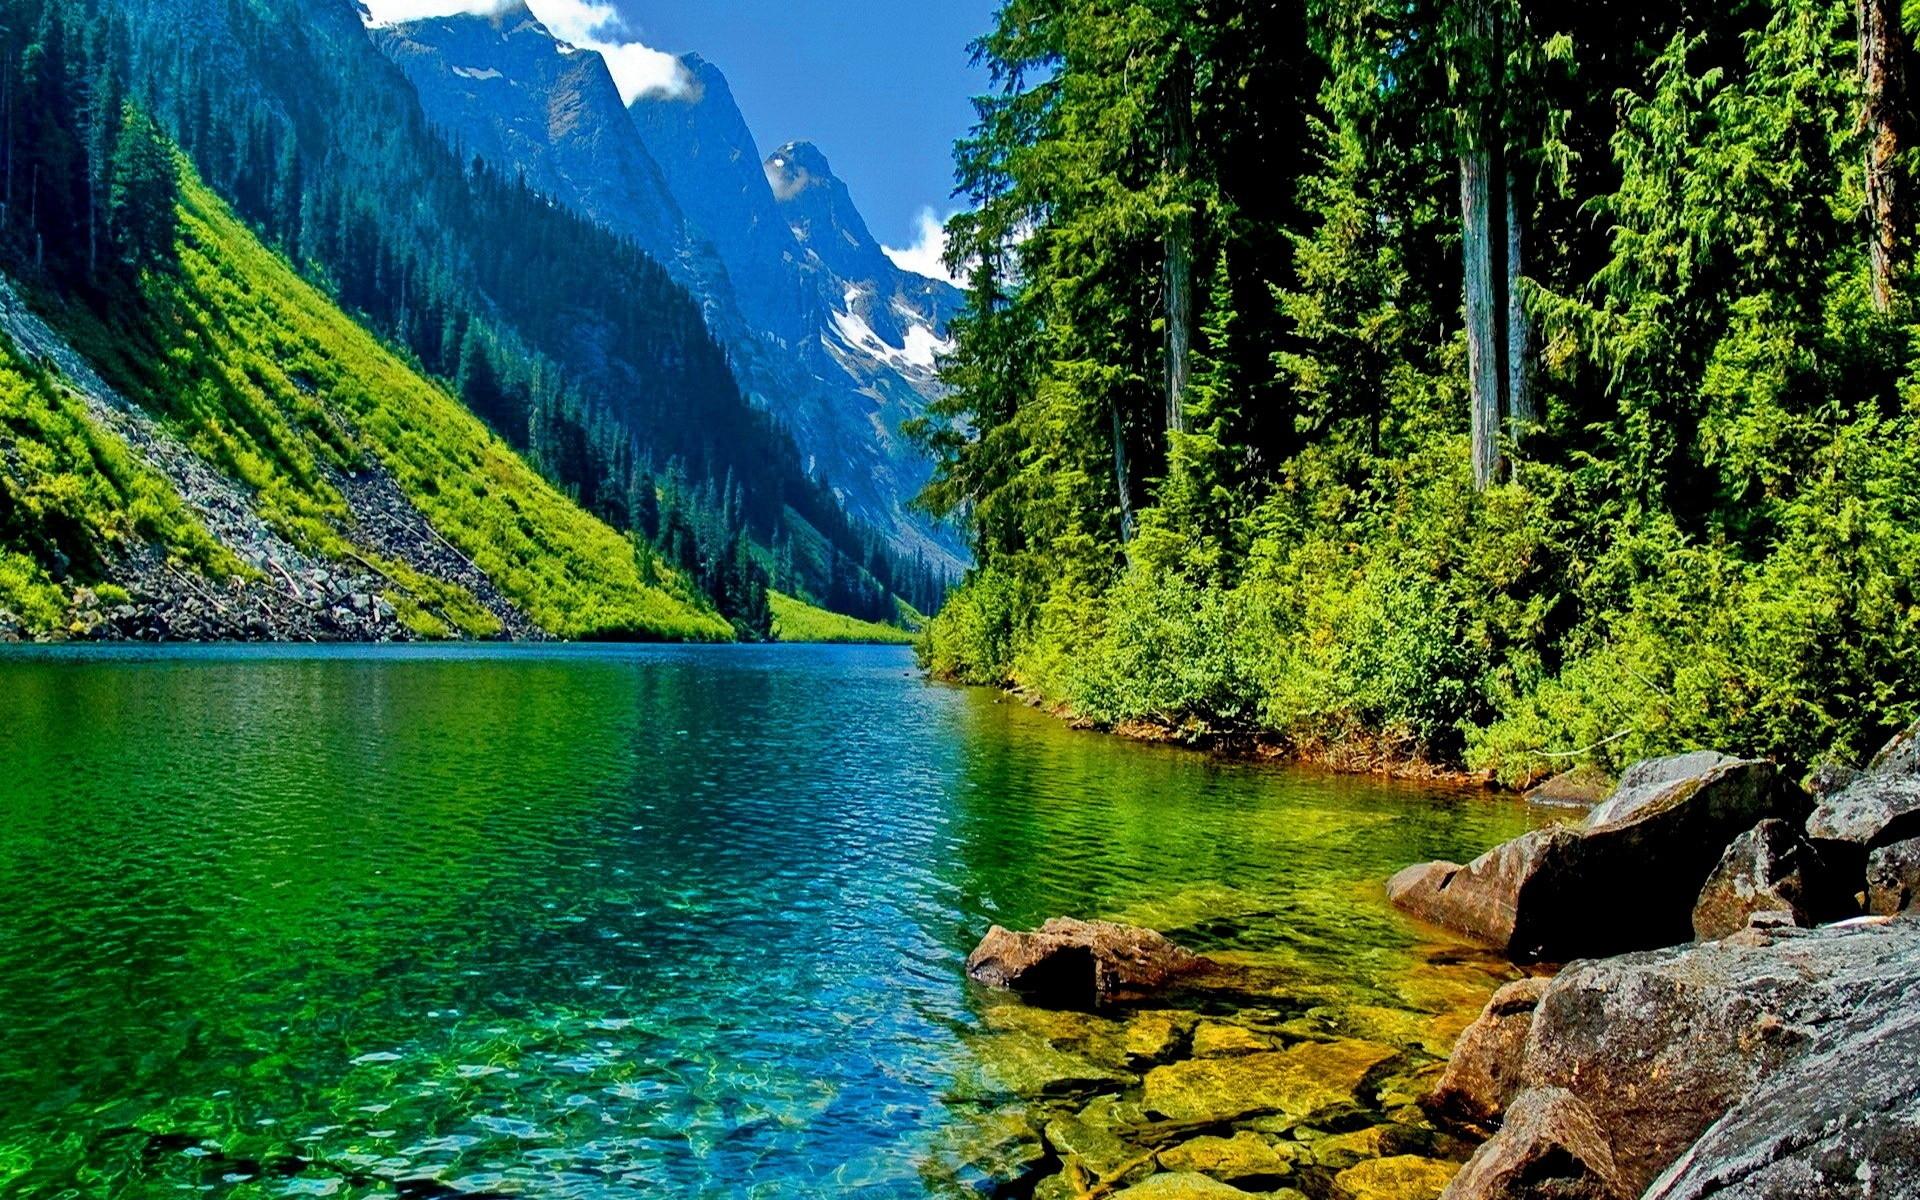 landscape mountain river HD Desktop Wallpaper HD Desktop Wallpaper 1920x1200